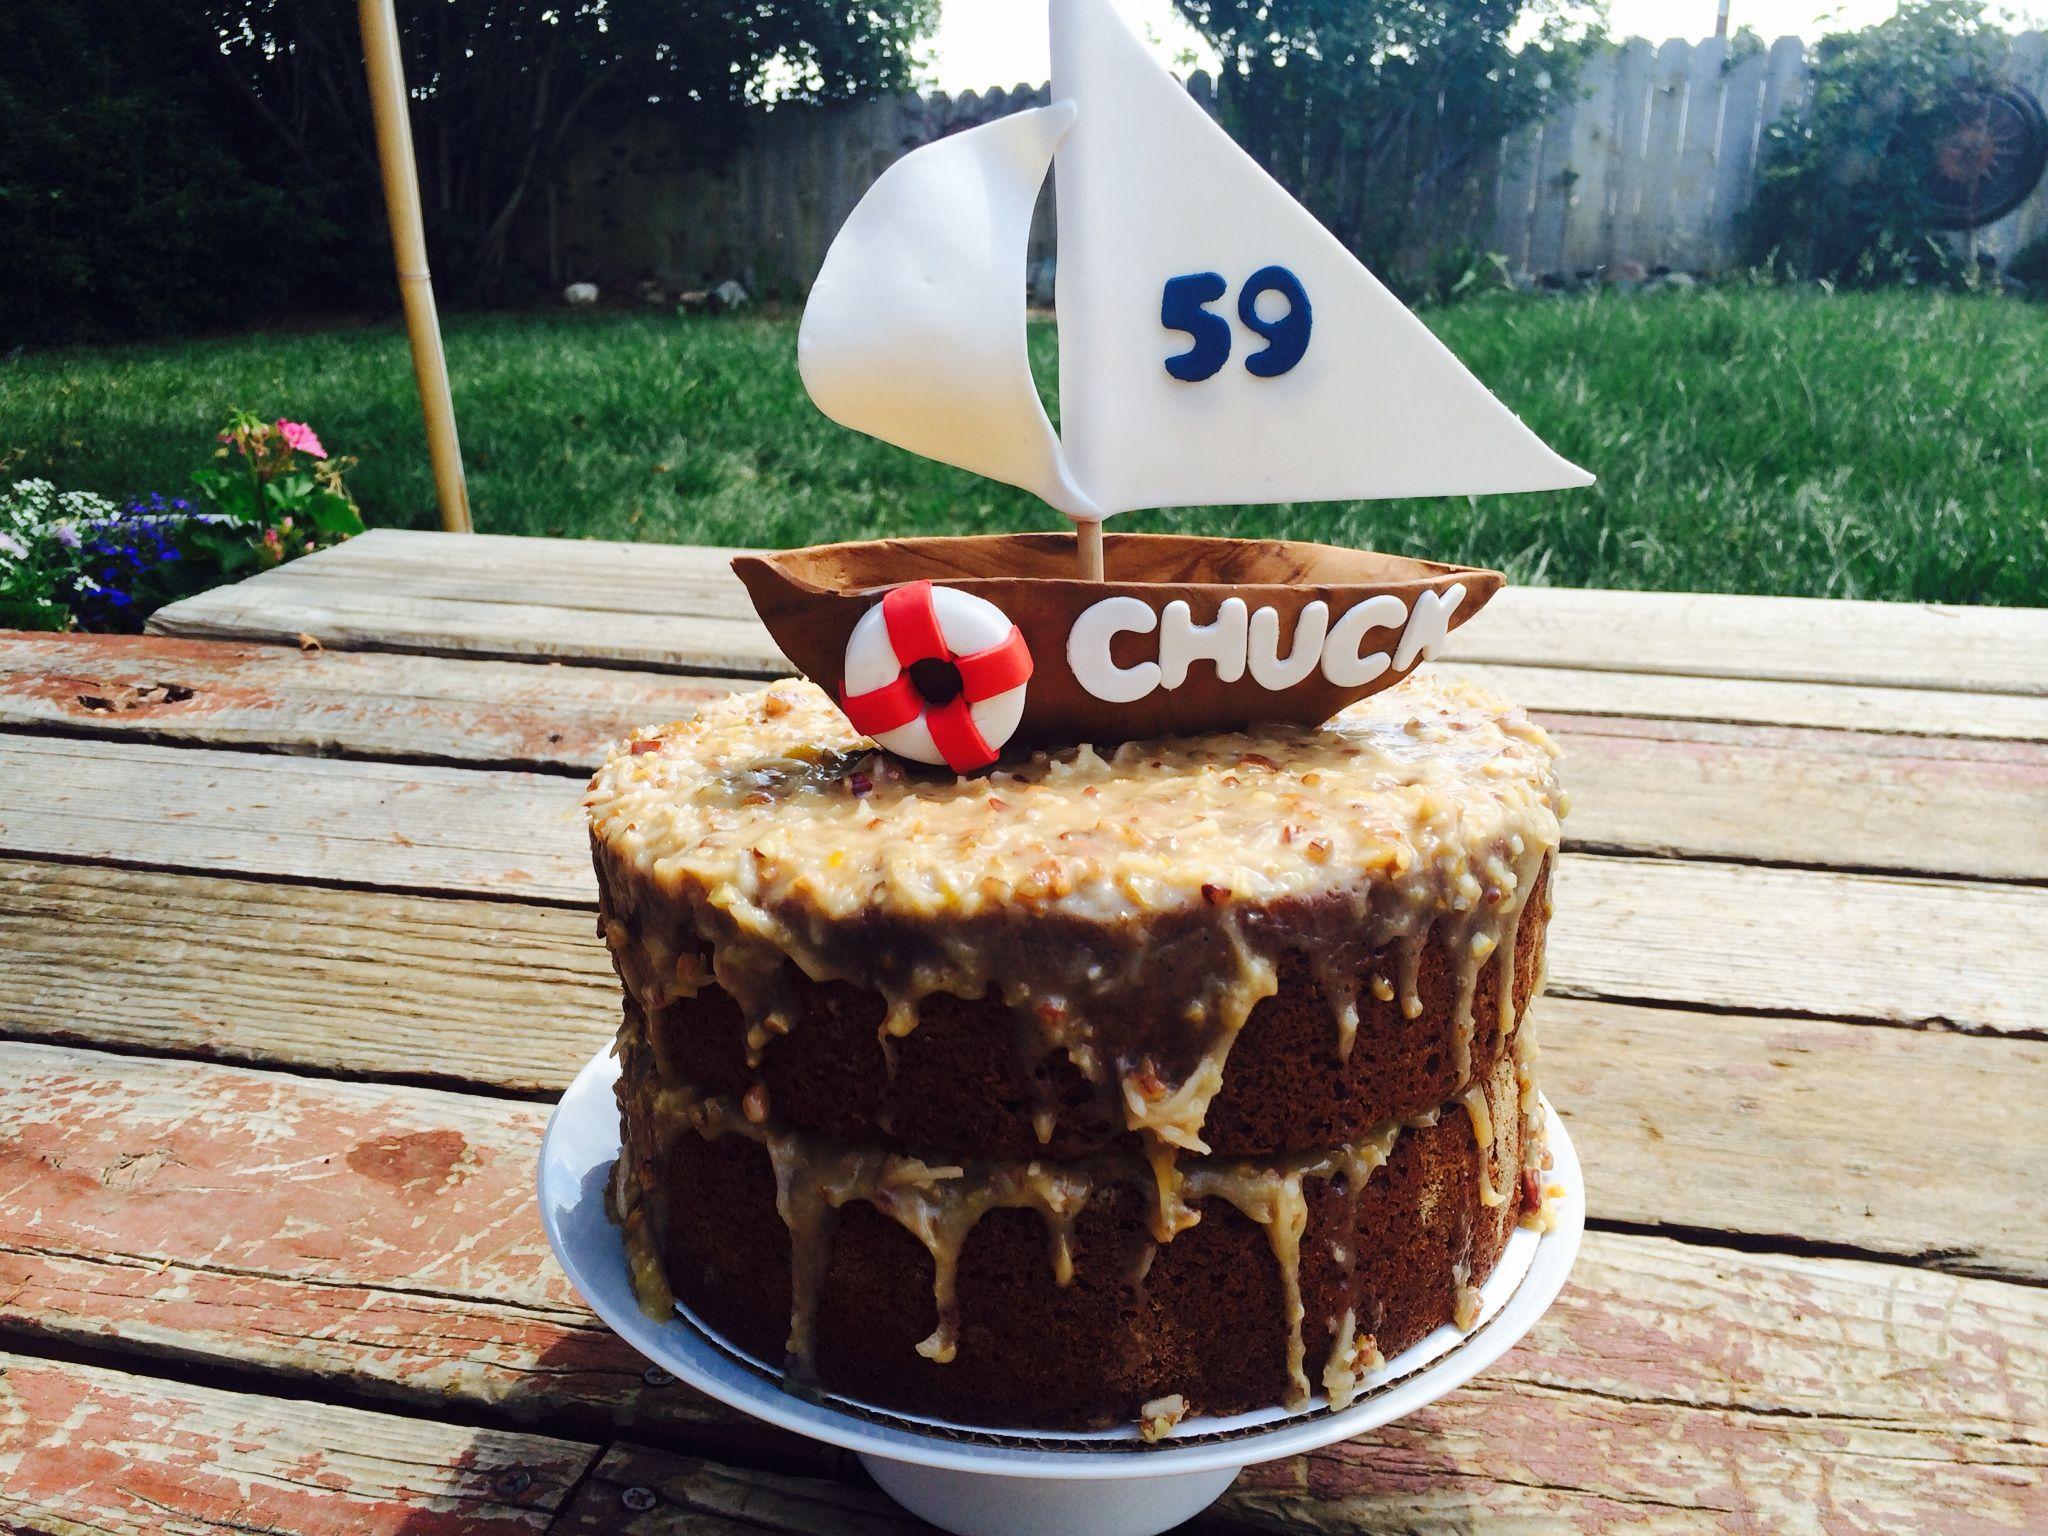 German Chocolate Cake #cakeonsunday #customcake #sailboat #sailing #germanchocolatecake #chocolatecake #birthdaycake